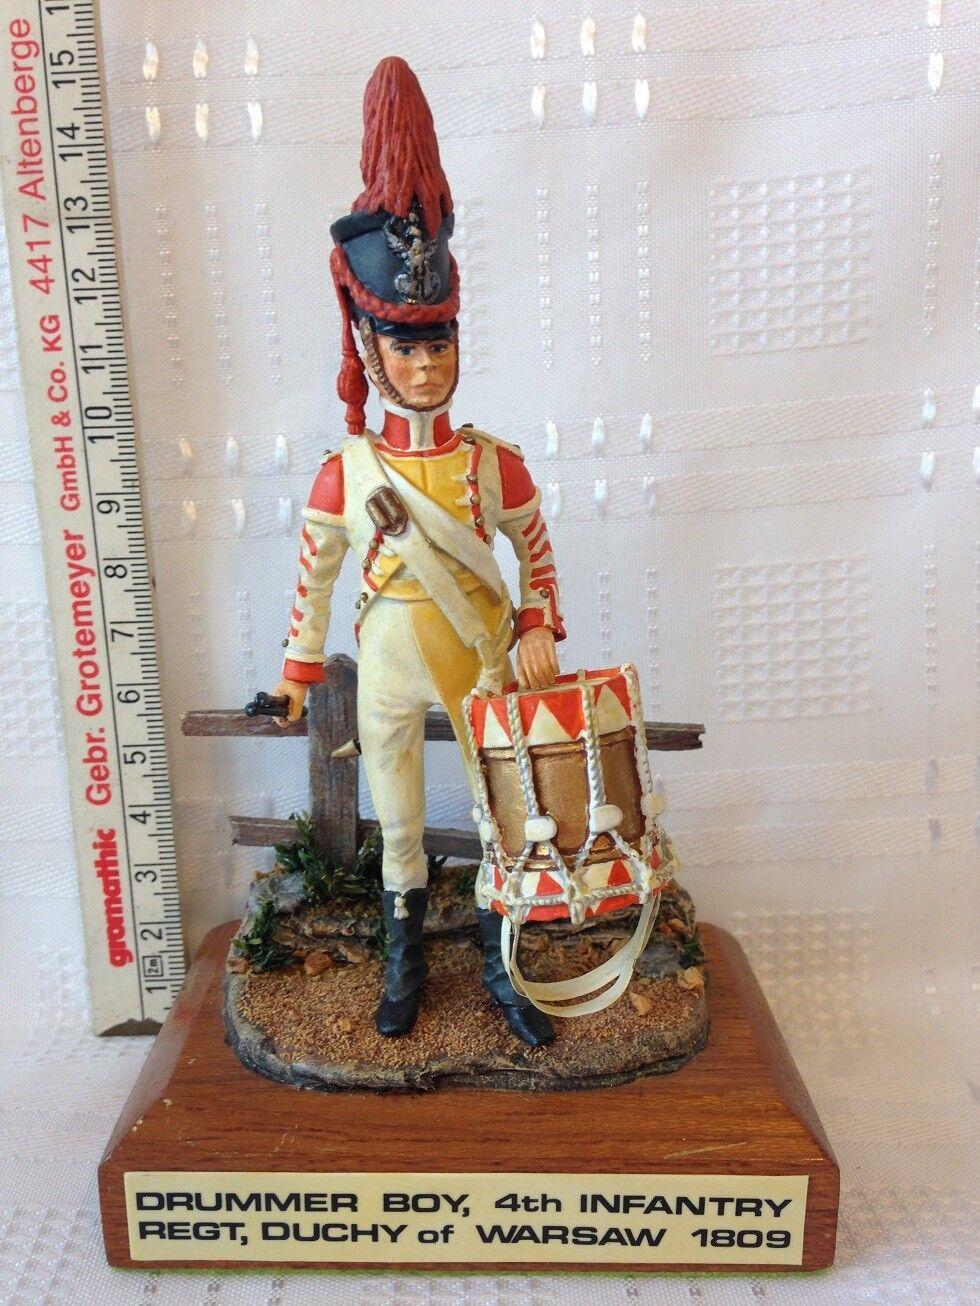 DRUMMER BOY 4th INFANTRY REGT DUCHY OF WARSAW - 1809. 125mm Die-Cast Figure.